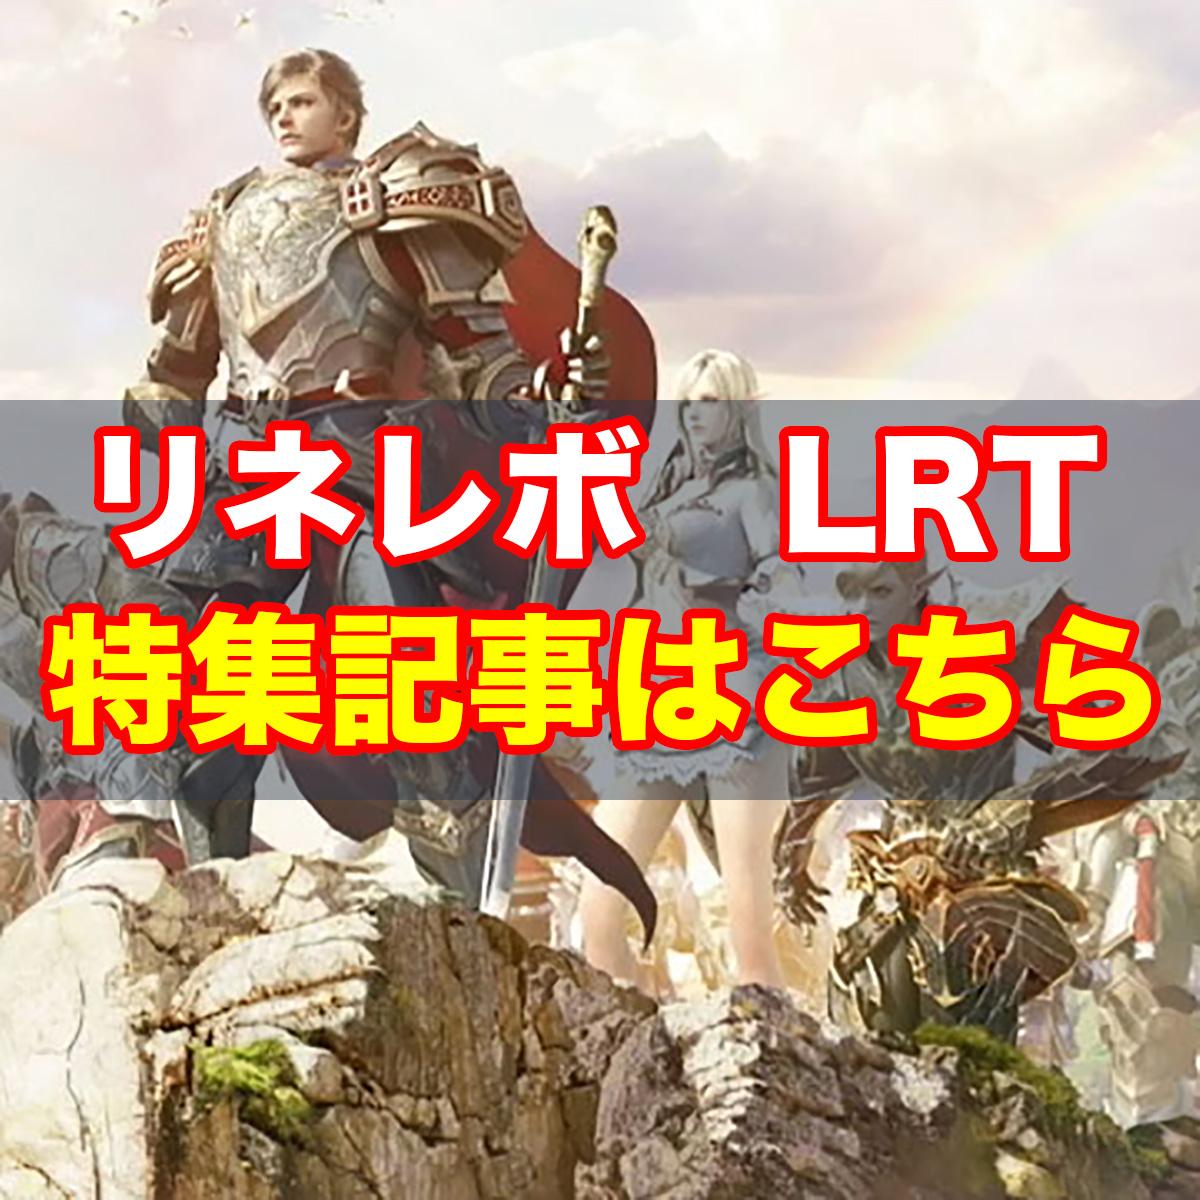 LRT特集記事ページ